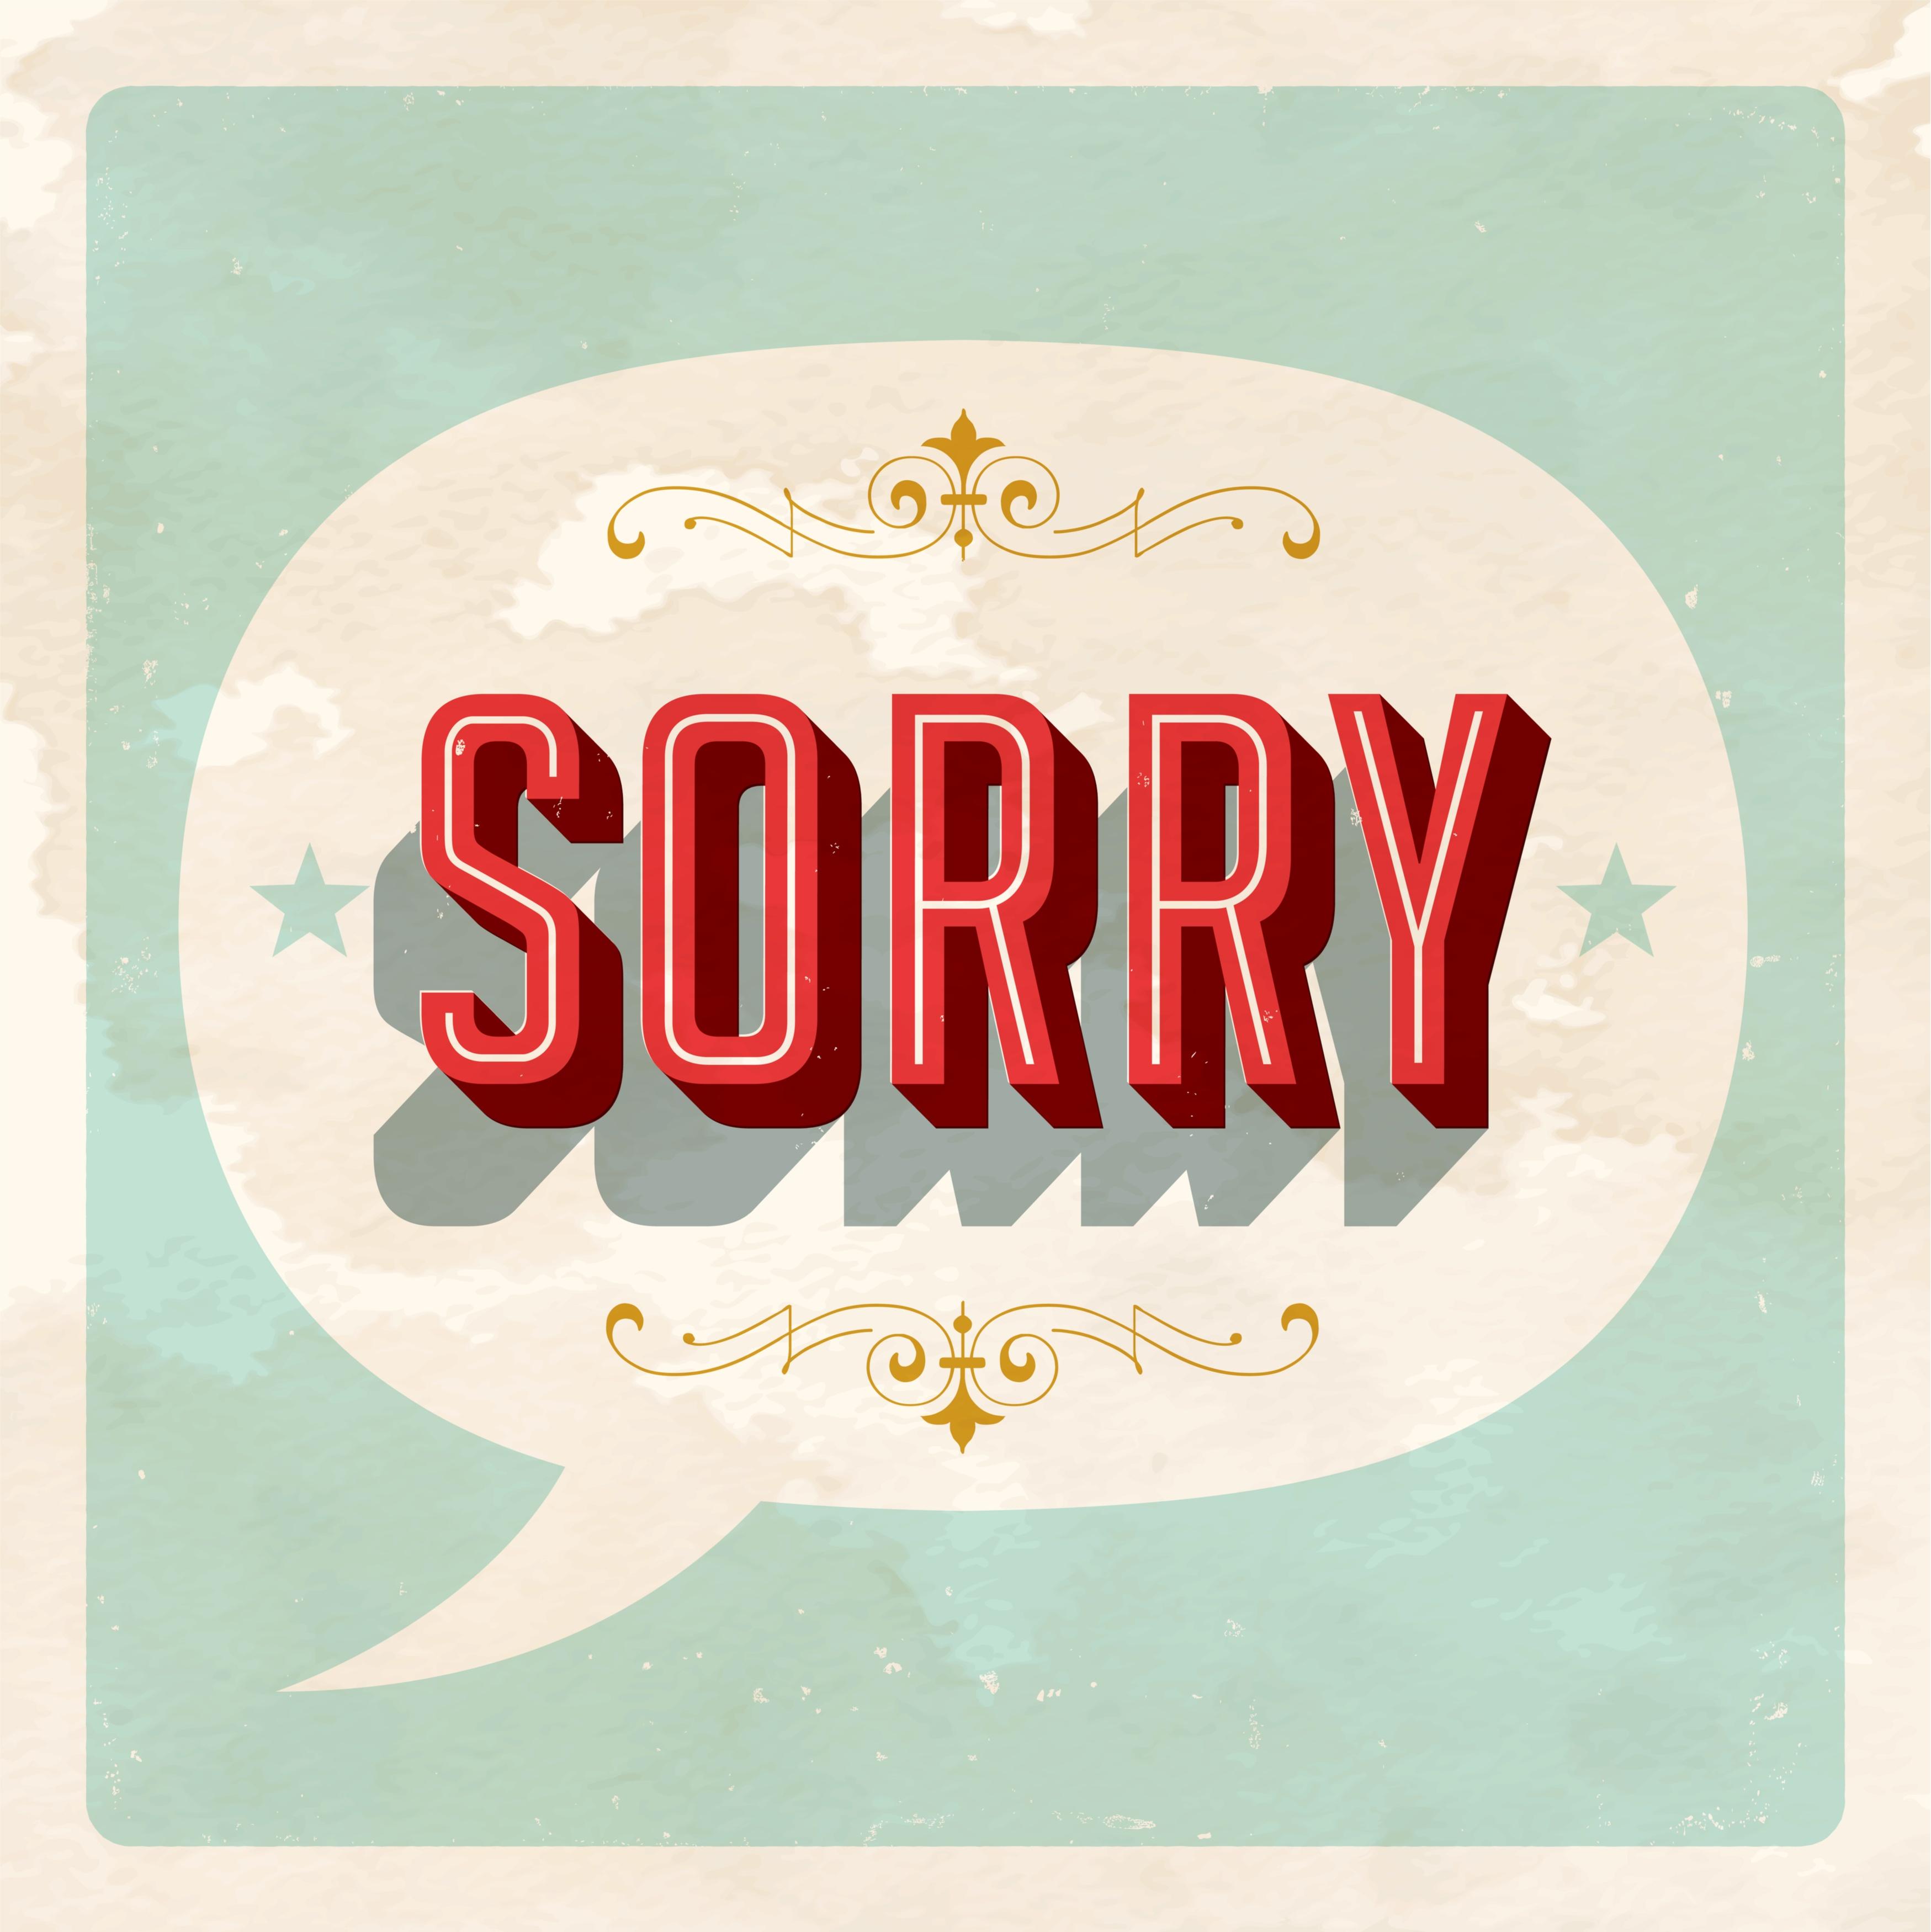 Social media apologies: 3 Rules